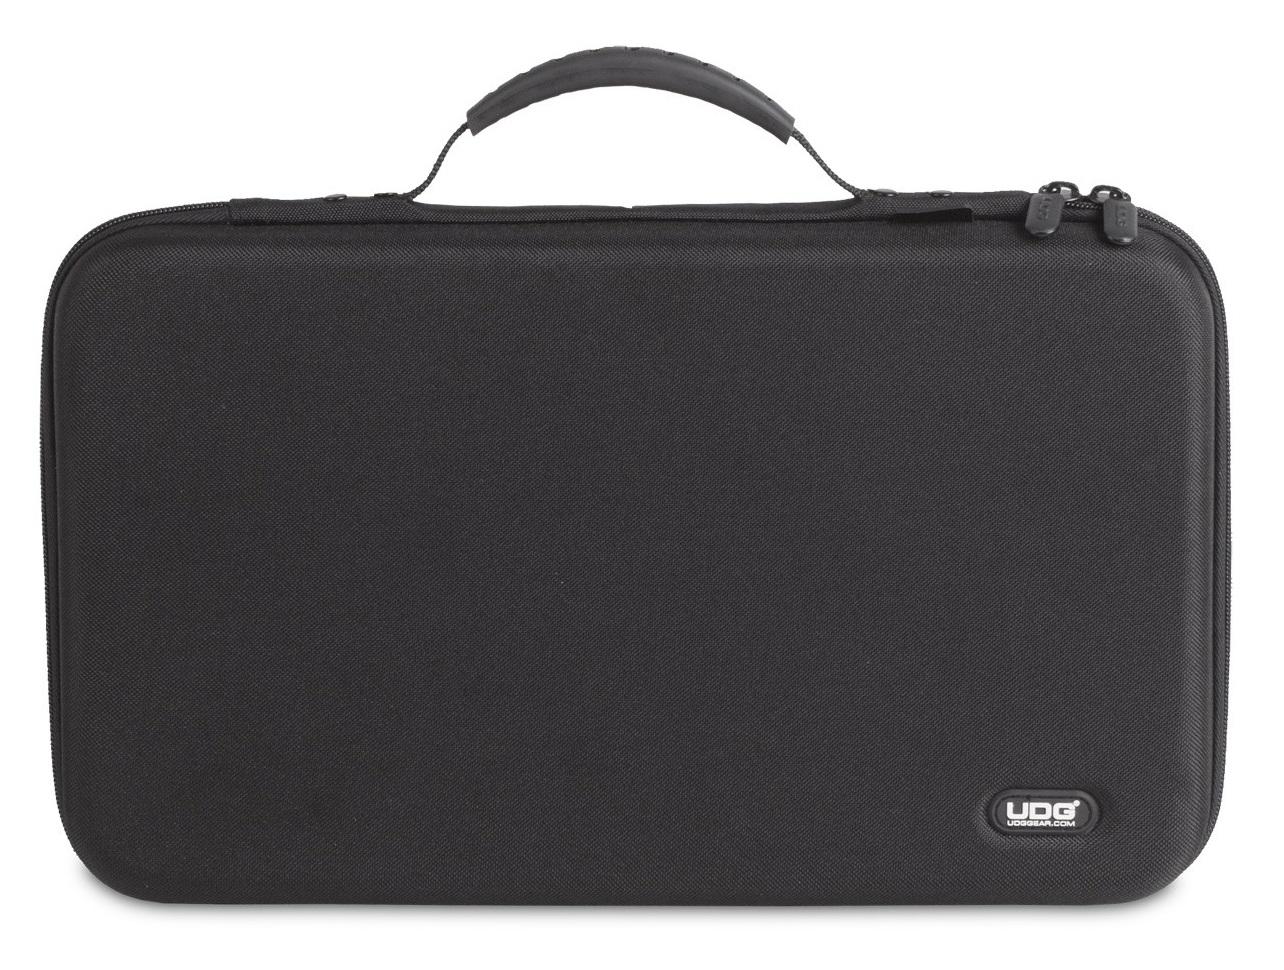 UDG Creator Pioneer DDJ-SP1 Hard case Black